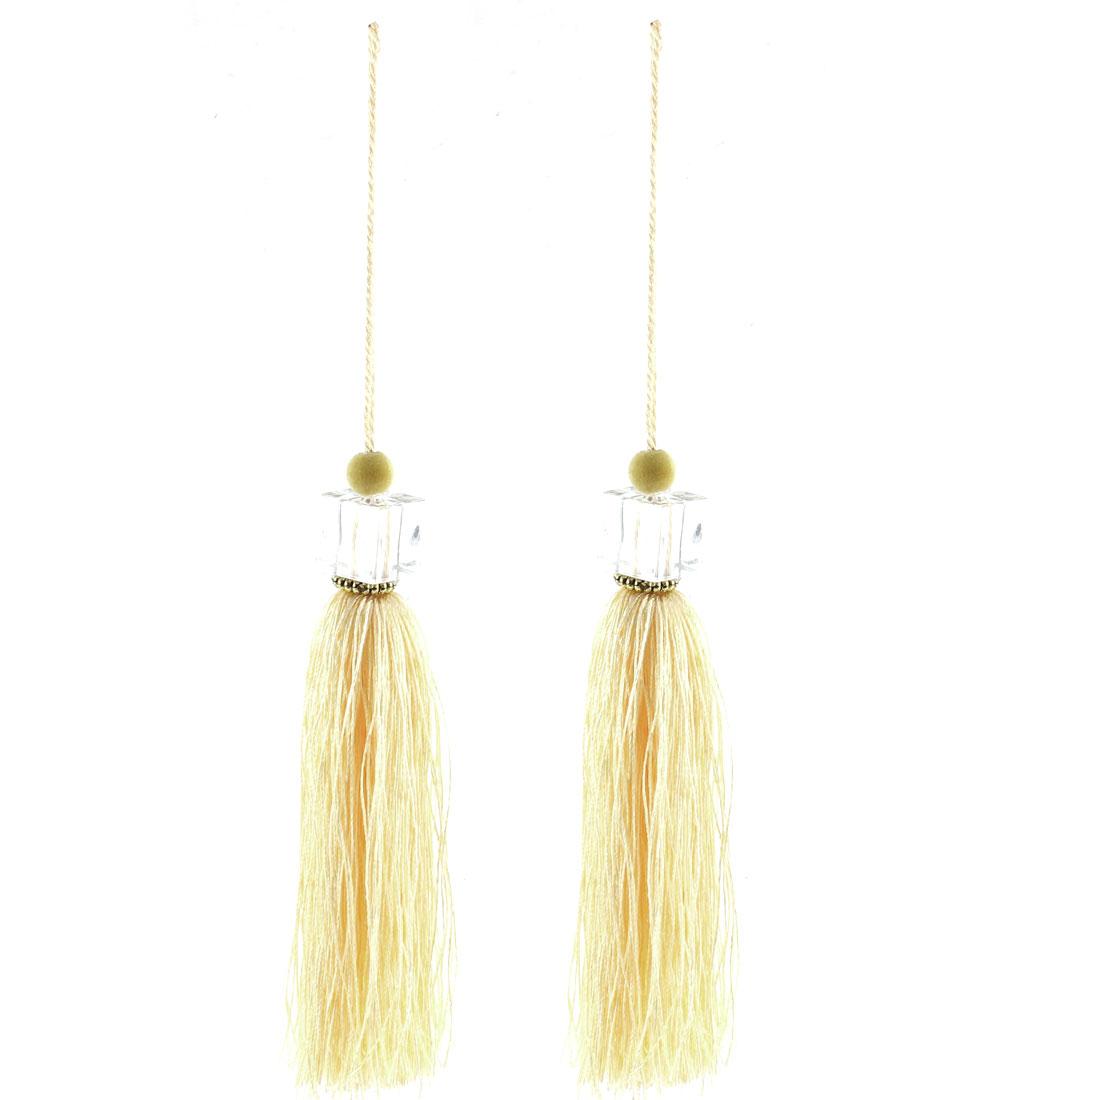 2Pcs Silky Tassels Pendant Sewing DIY Craft Supply Curtain Drapery Deco Light Yellow